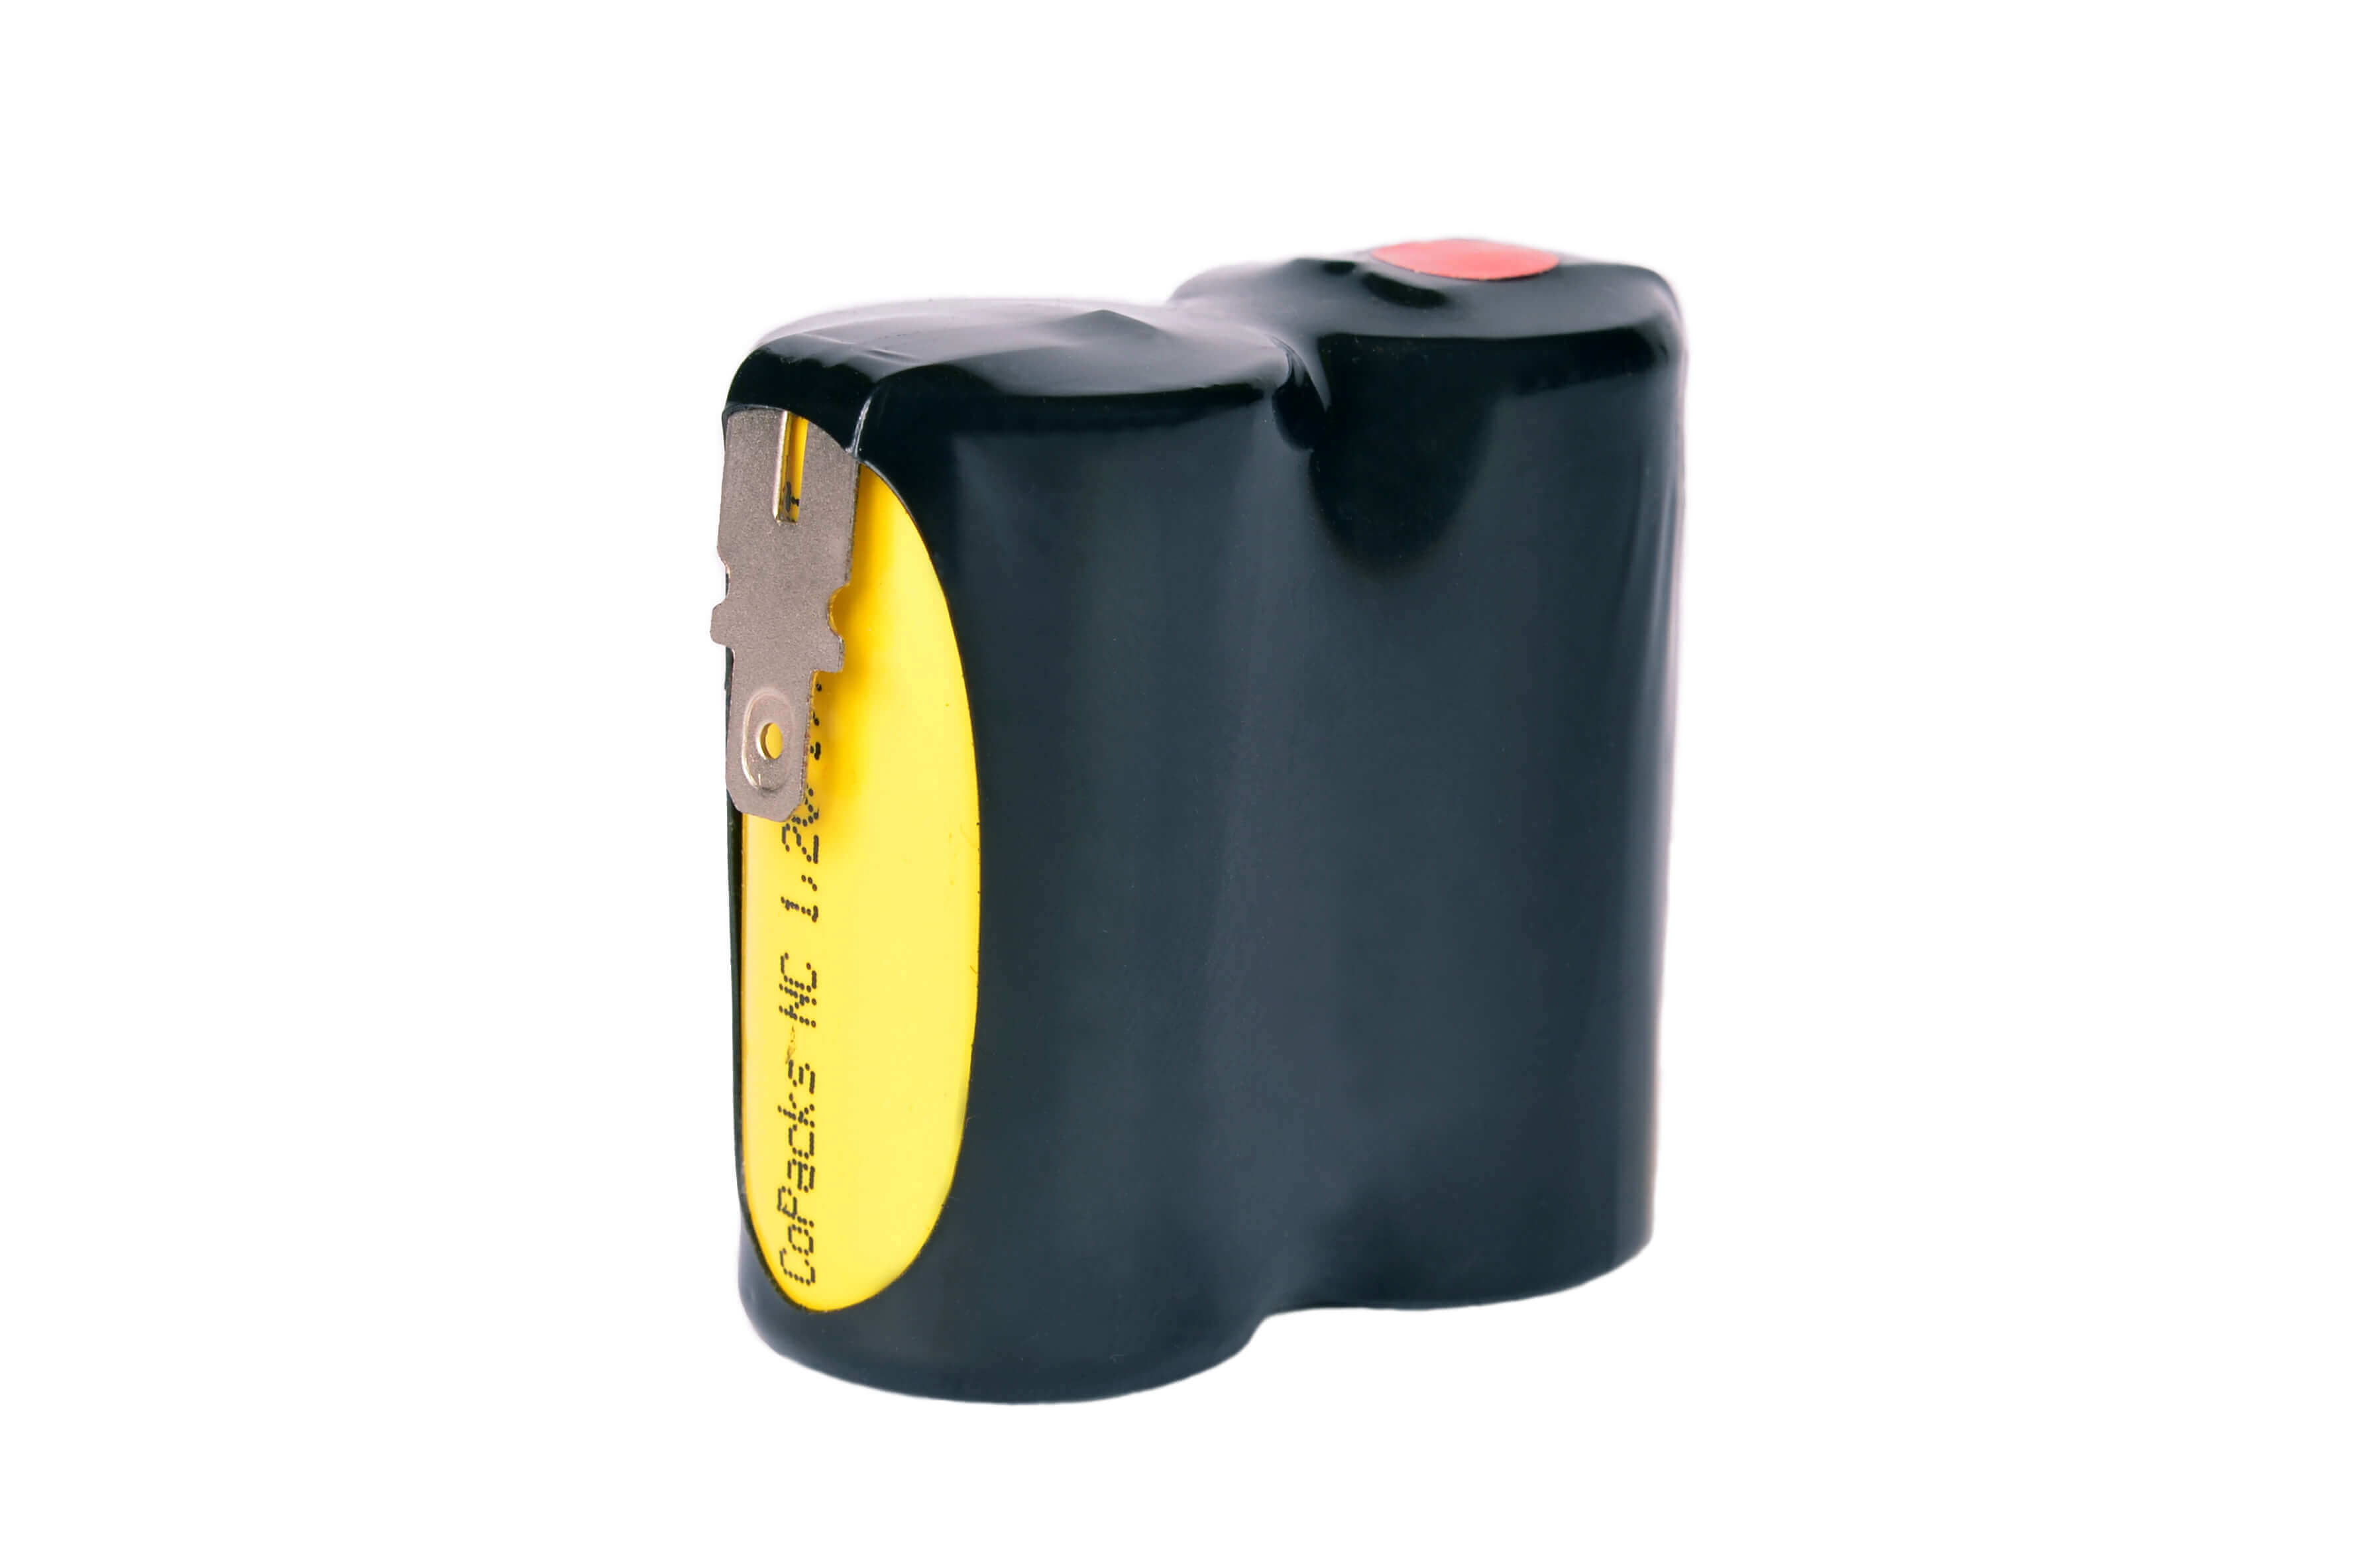 Akkupack Notlicht Notbeleuchtung 2,4V / 4000mAh (4,0Ah) Reihe mit Faston Anschlüssen